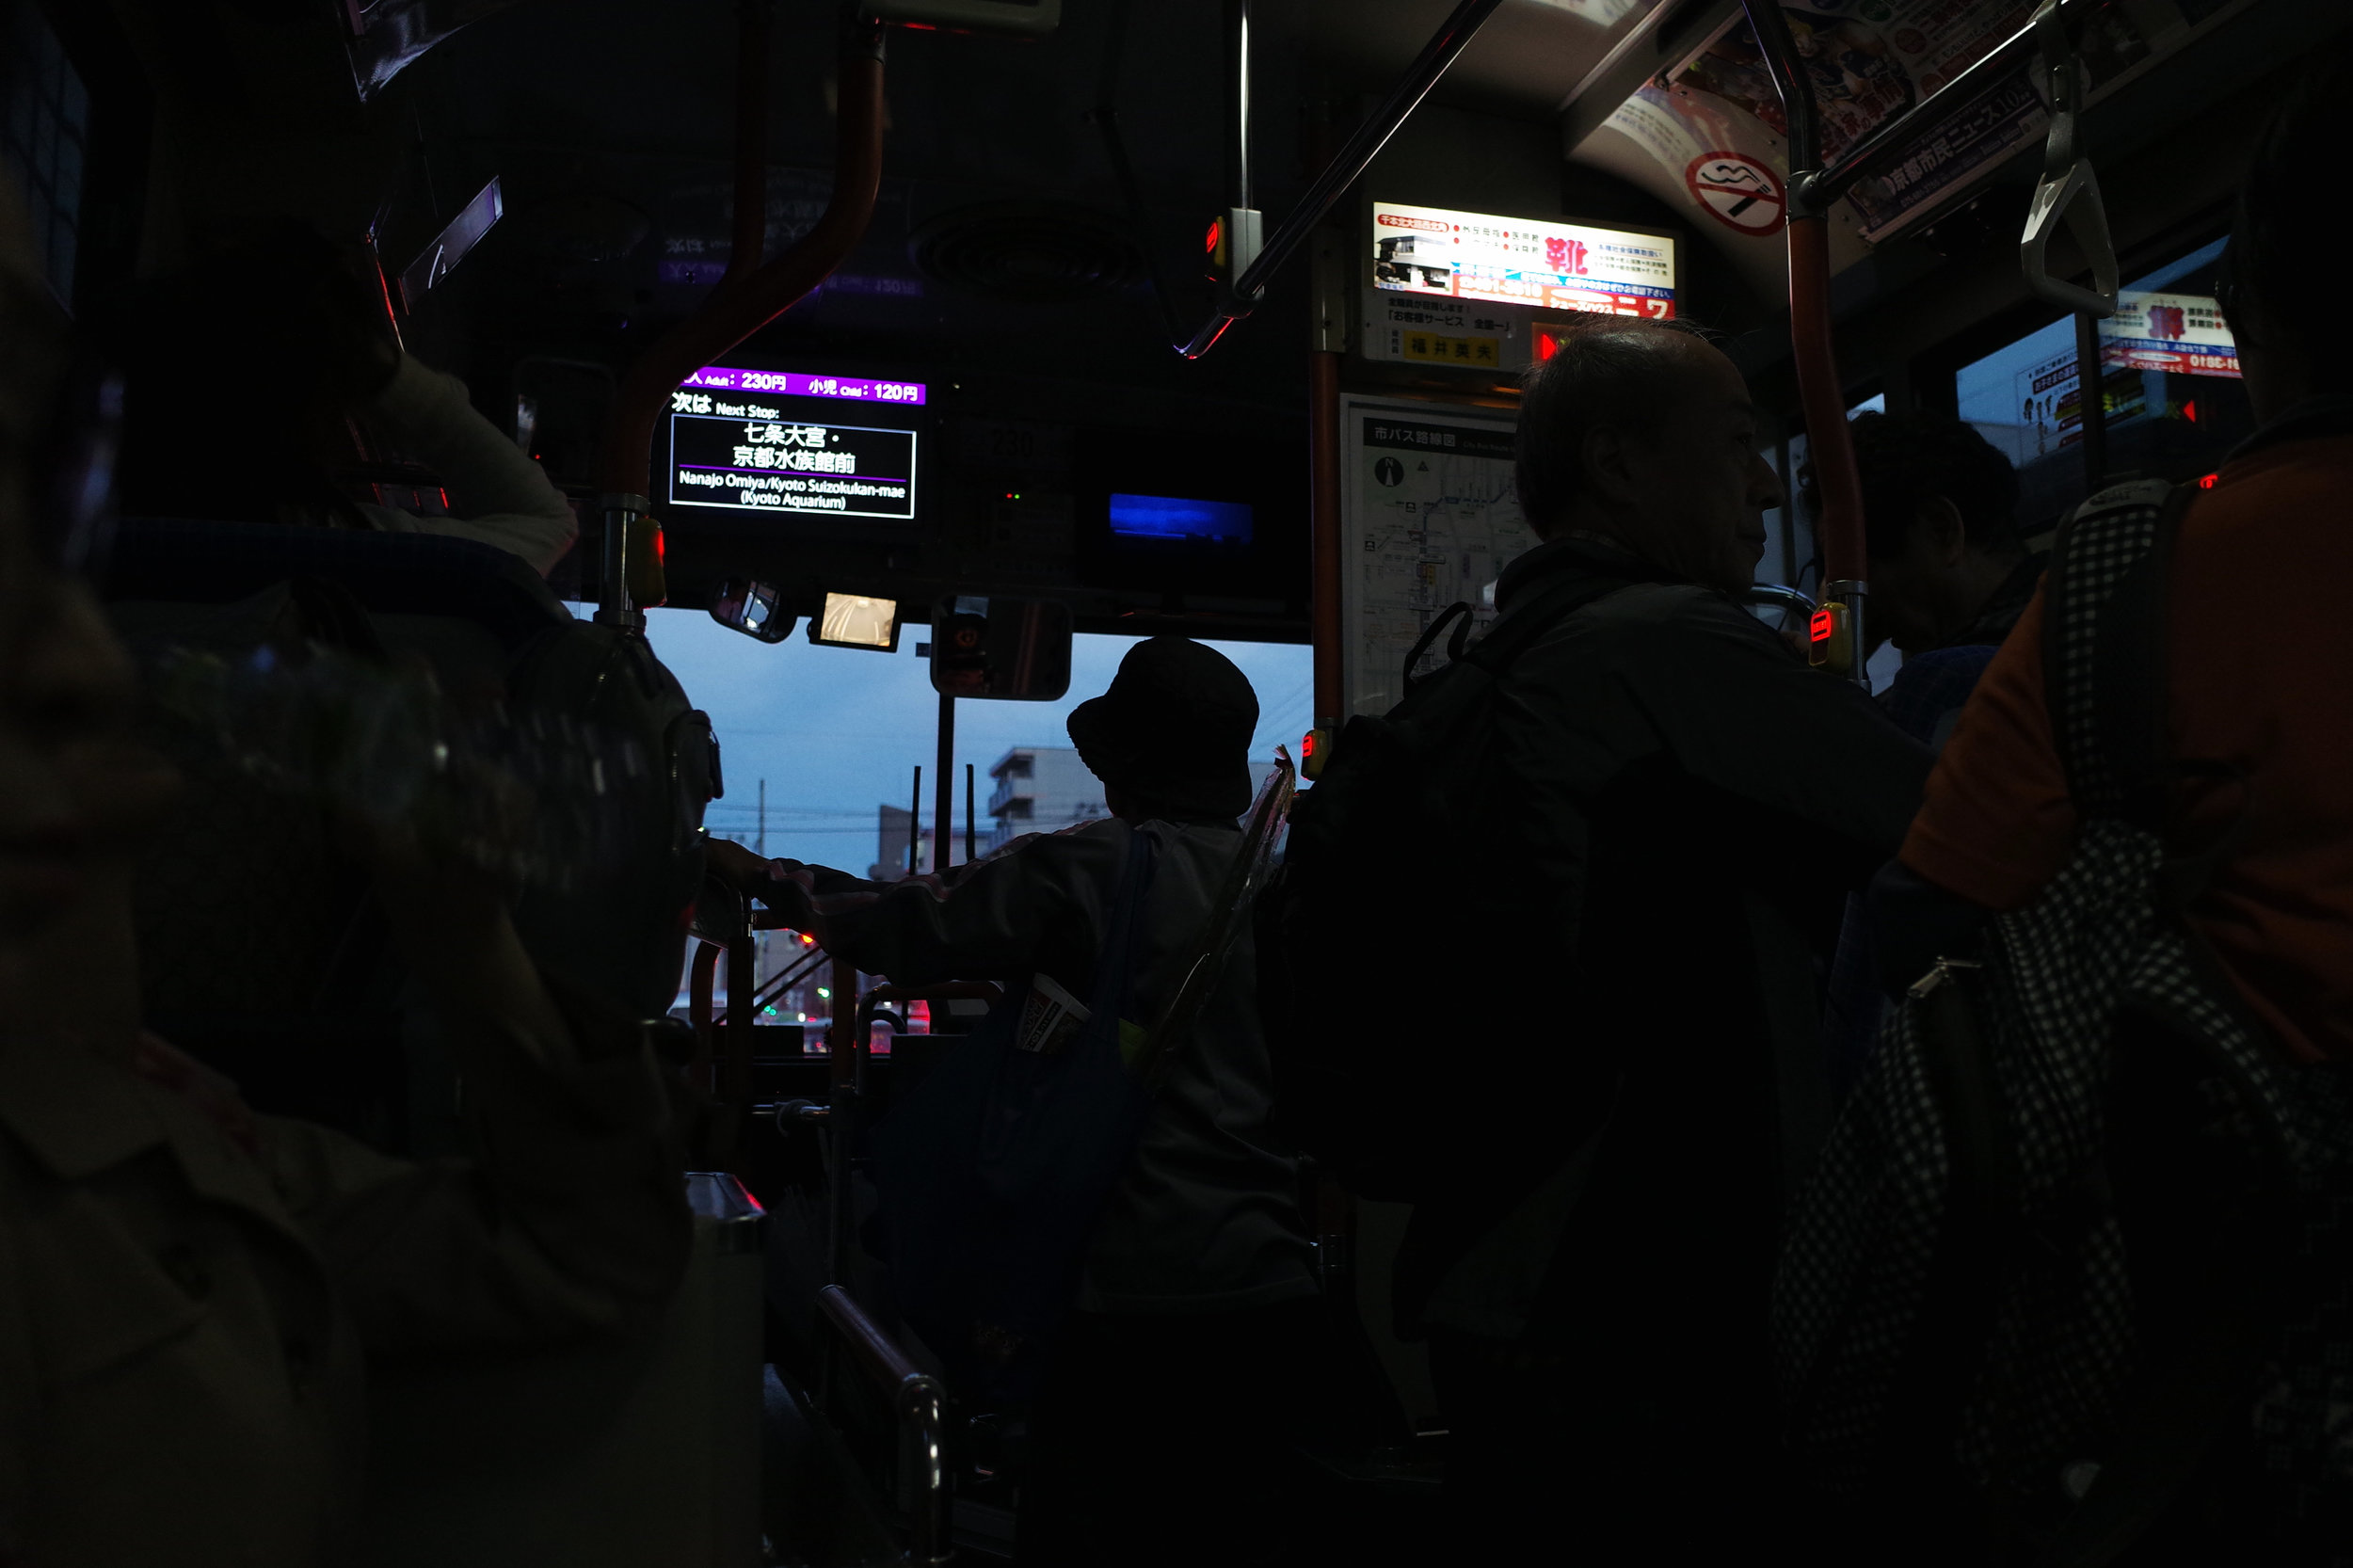 kyoto bus (1).jpg